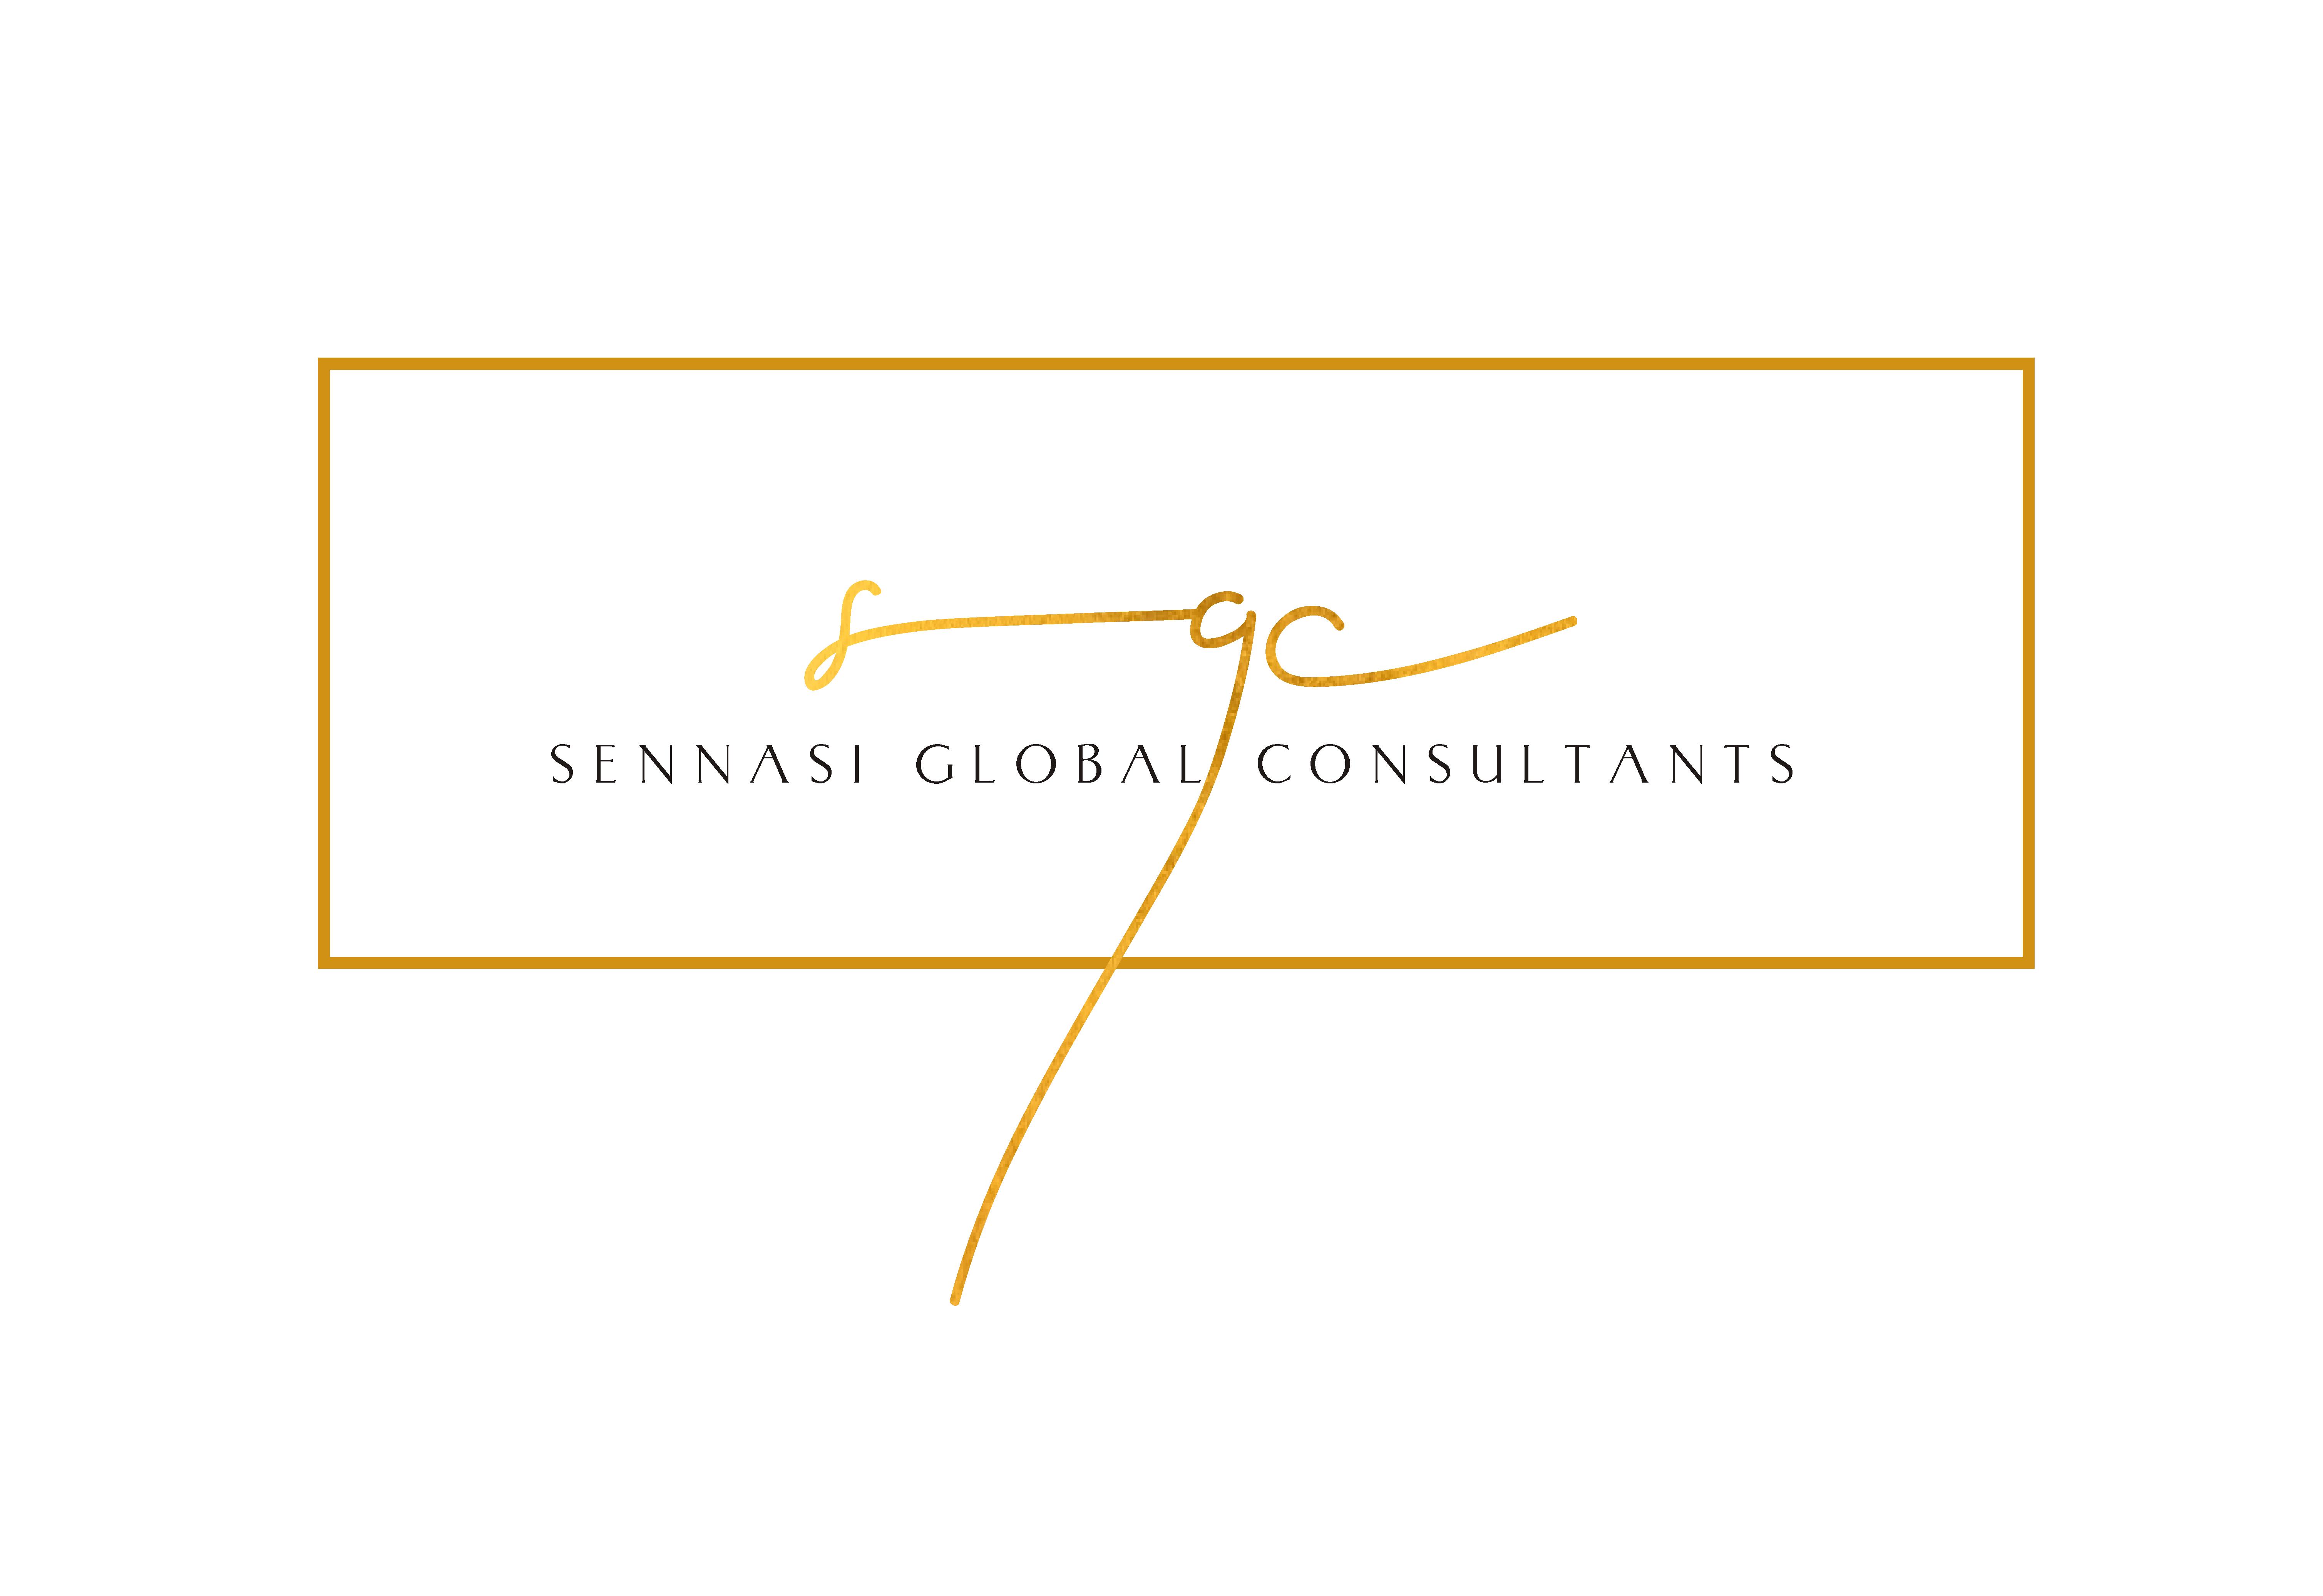 sennasi global consultants